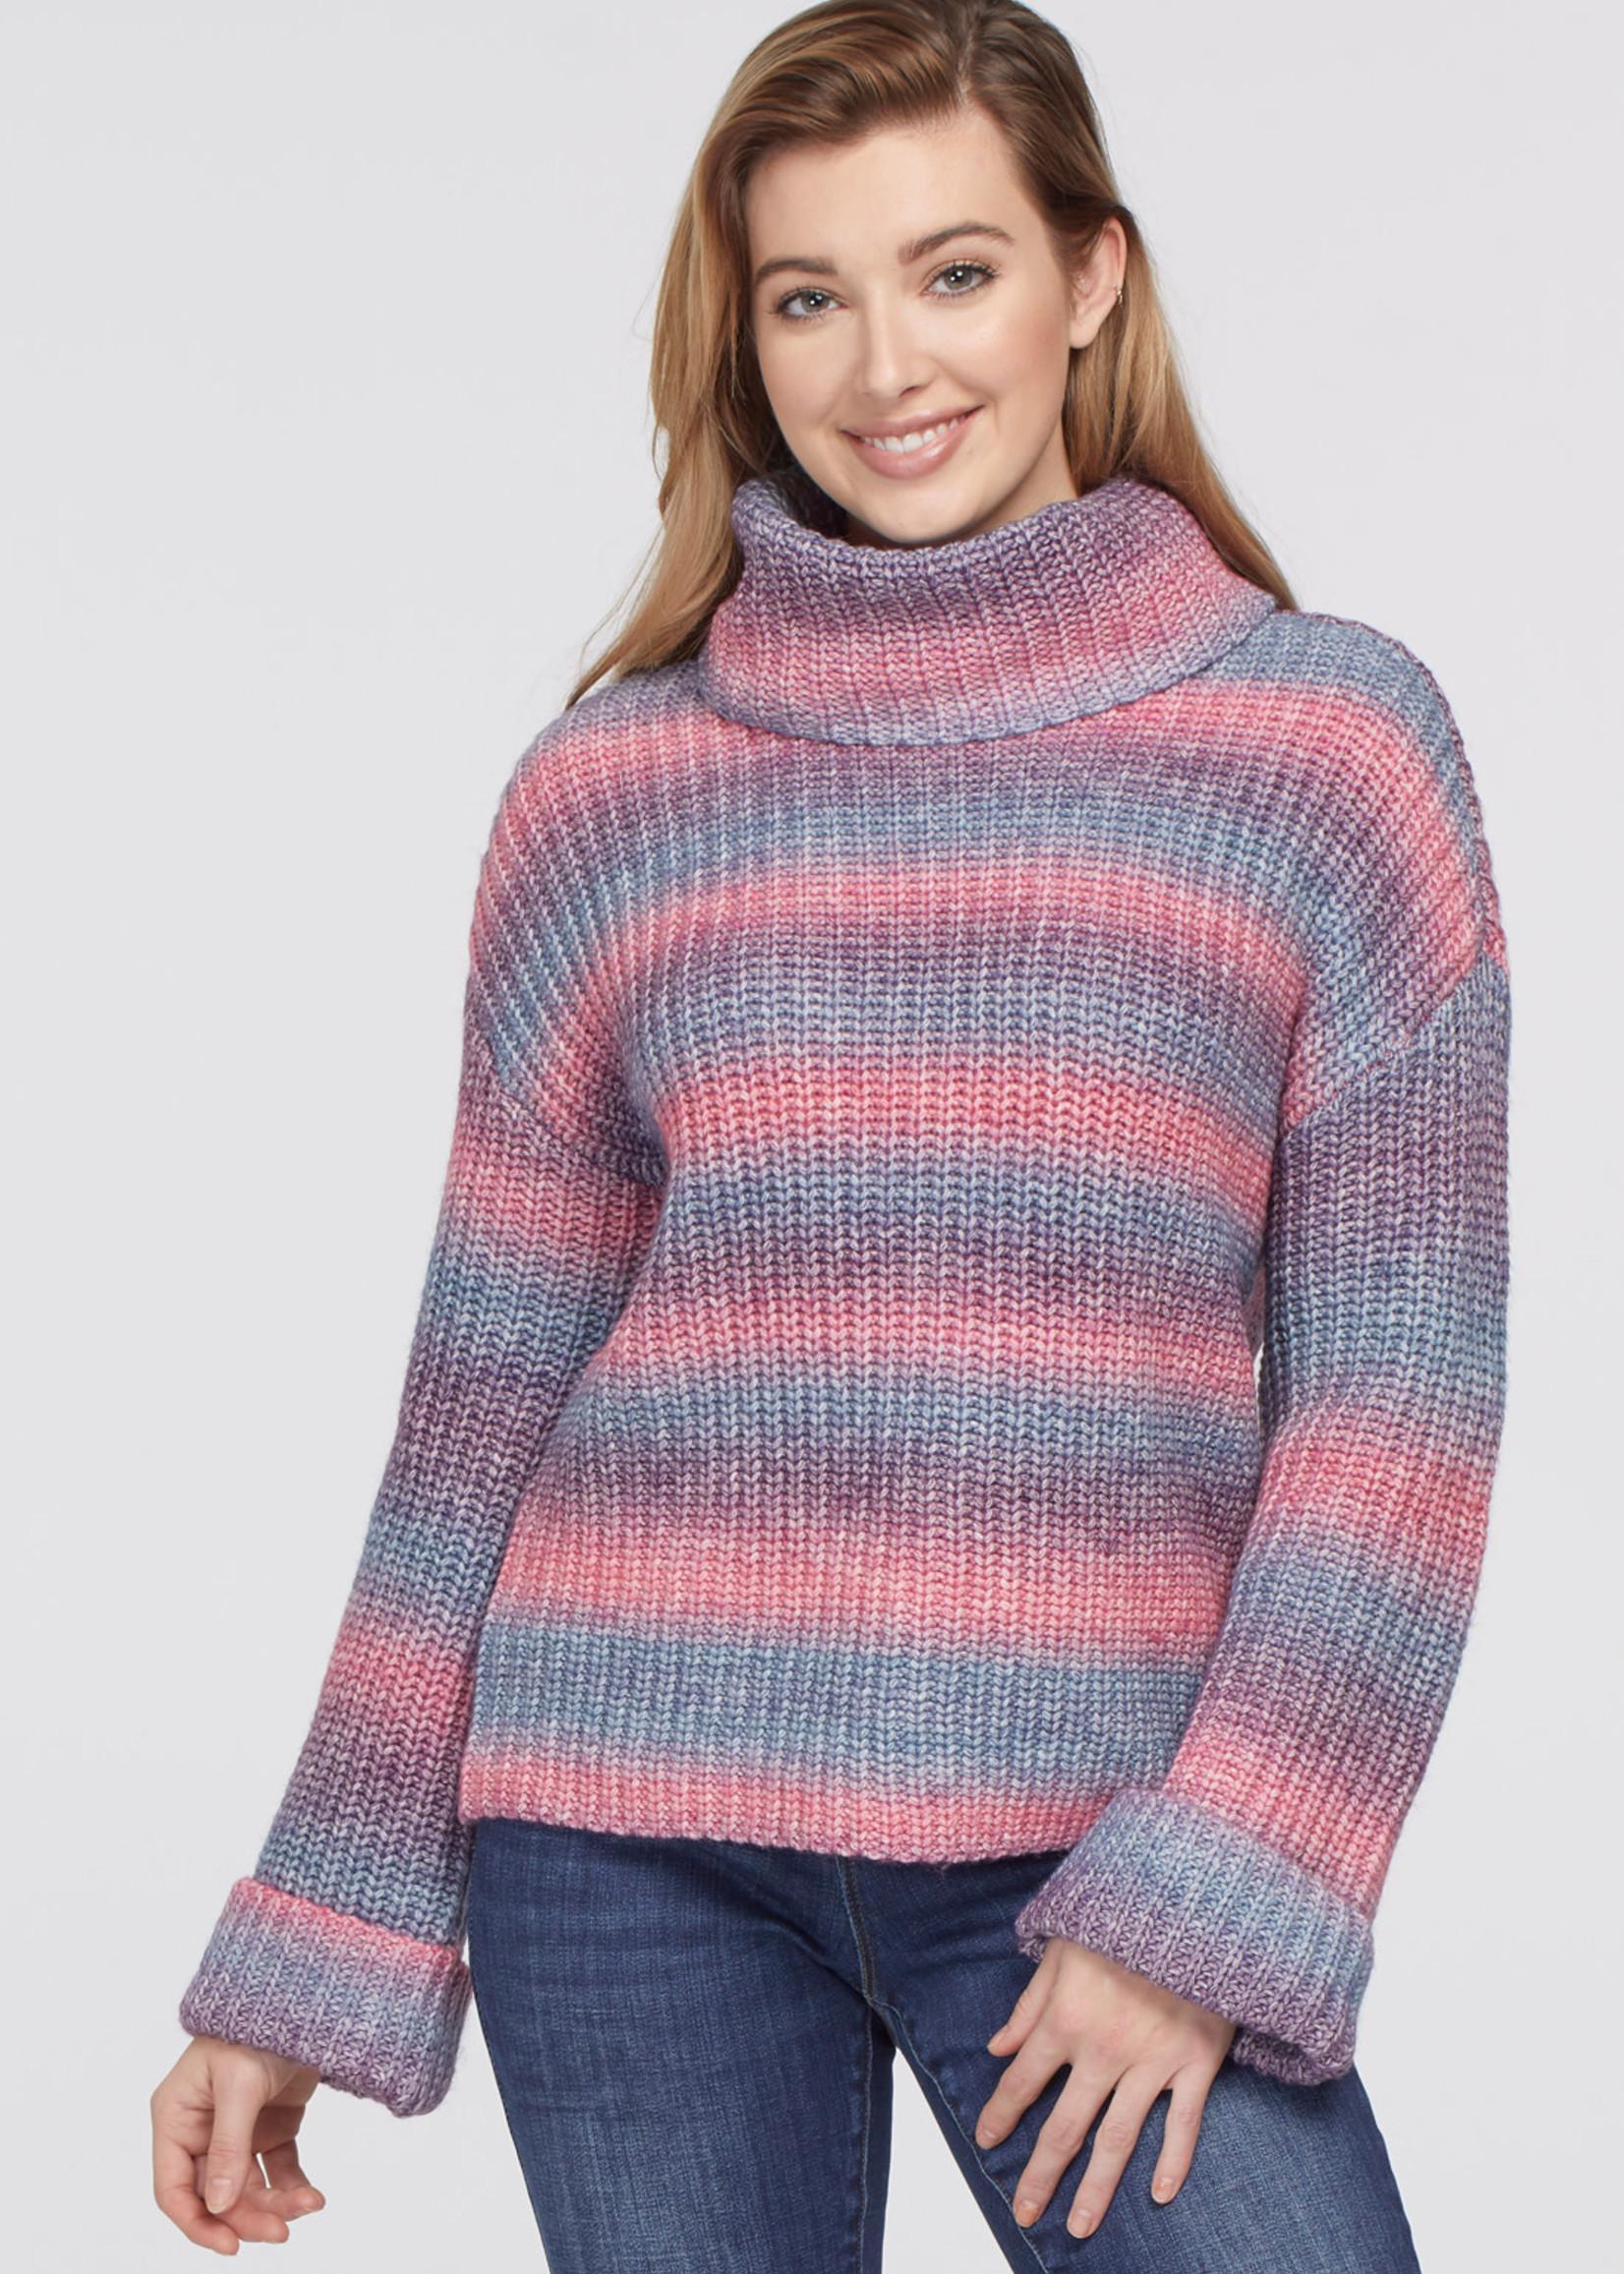 Tribal Cowl Neck Long Sleeve Sweater 67640